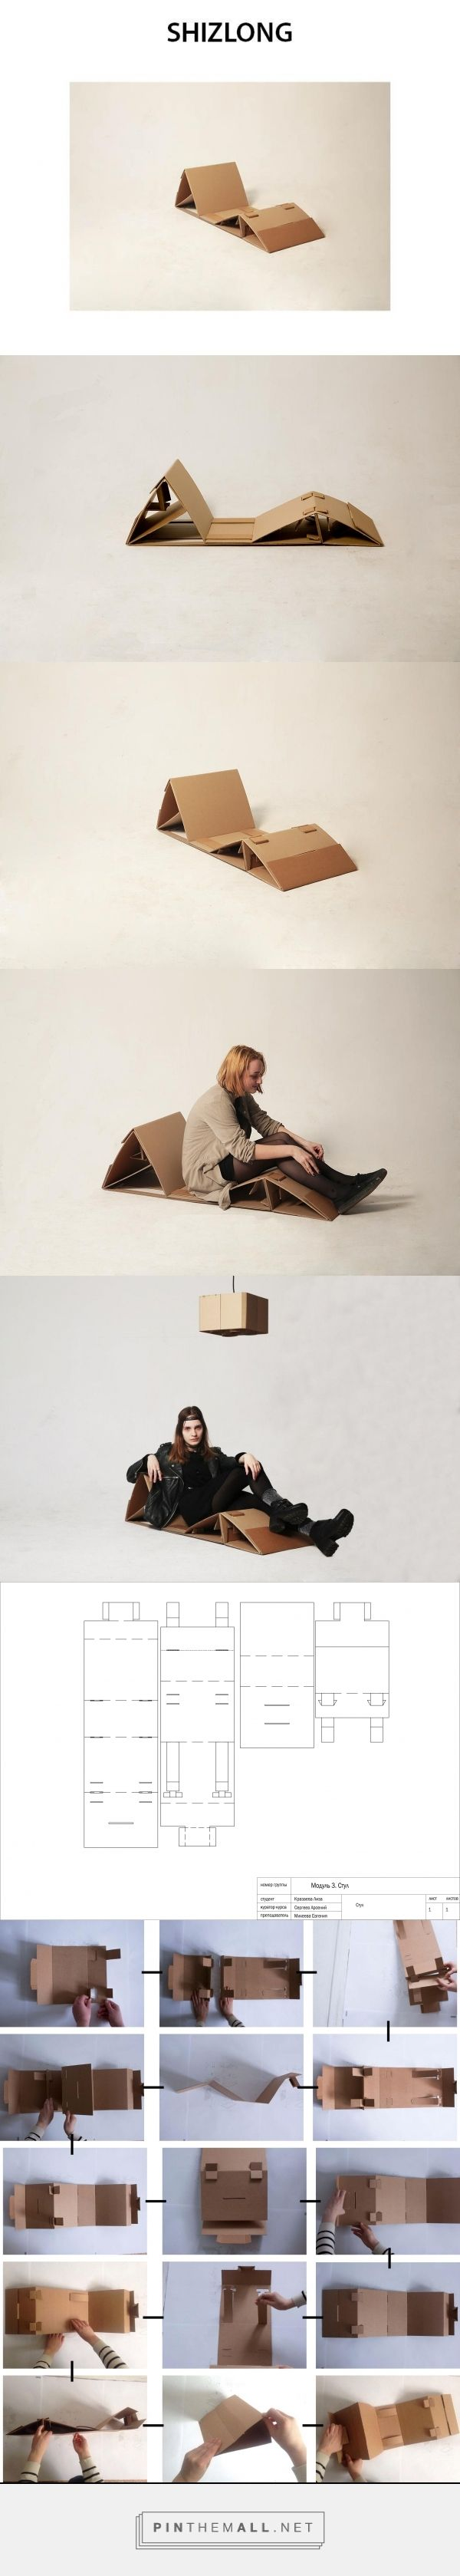 Cardboard chaise lounge by Elizaveta Krazaeva Curator: Arseniy Sergeev HSE ART AND DESIGN SCHOOL 2016